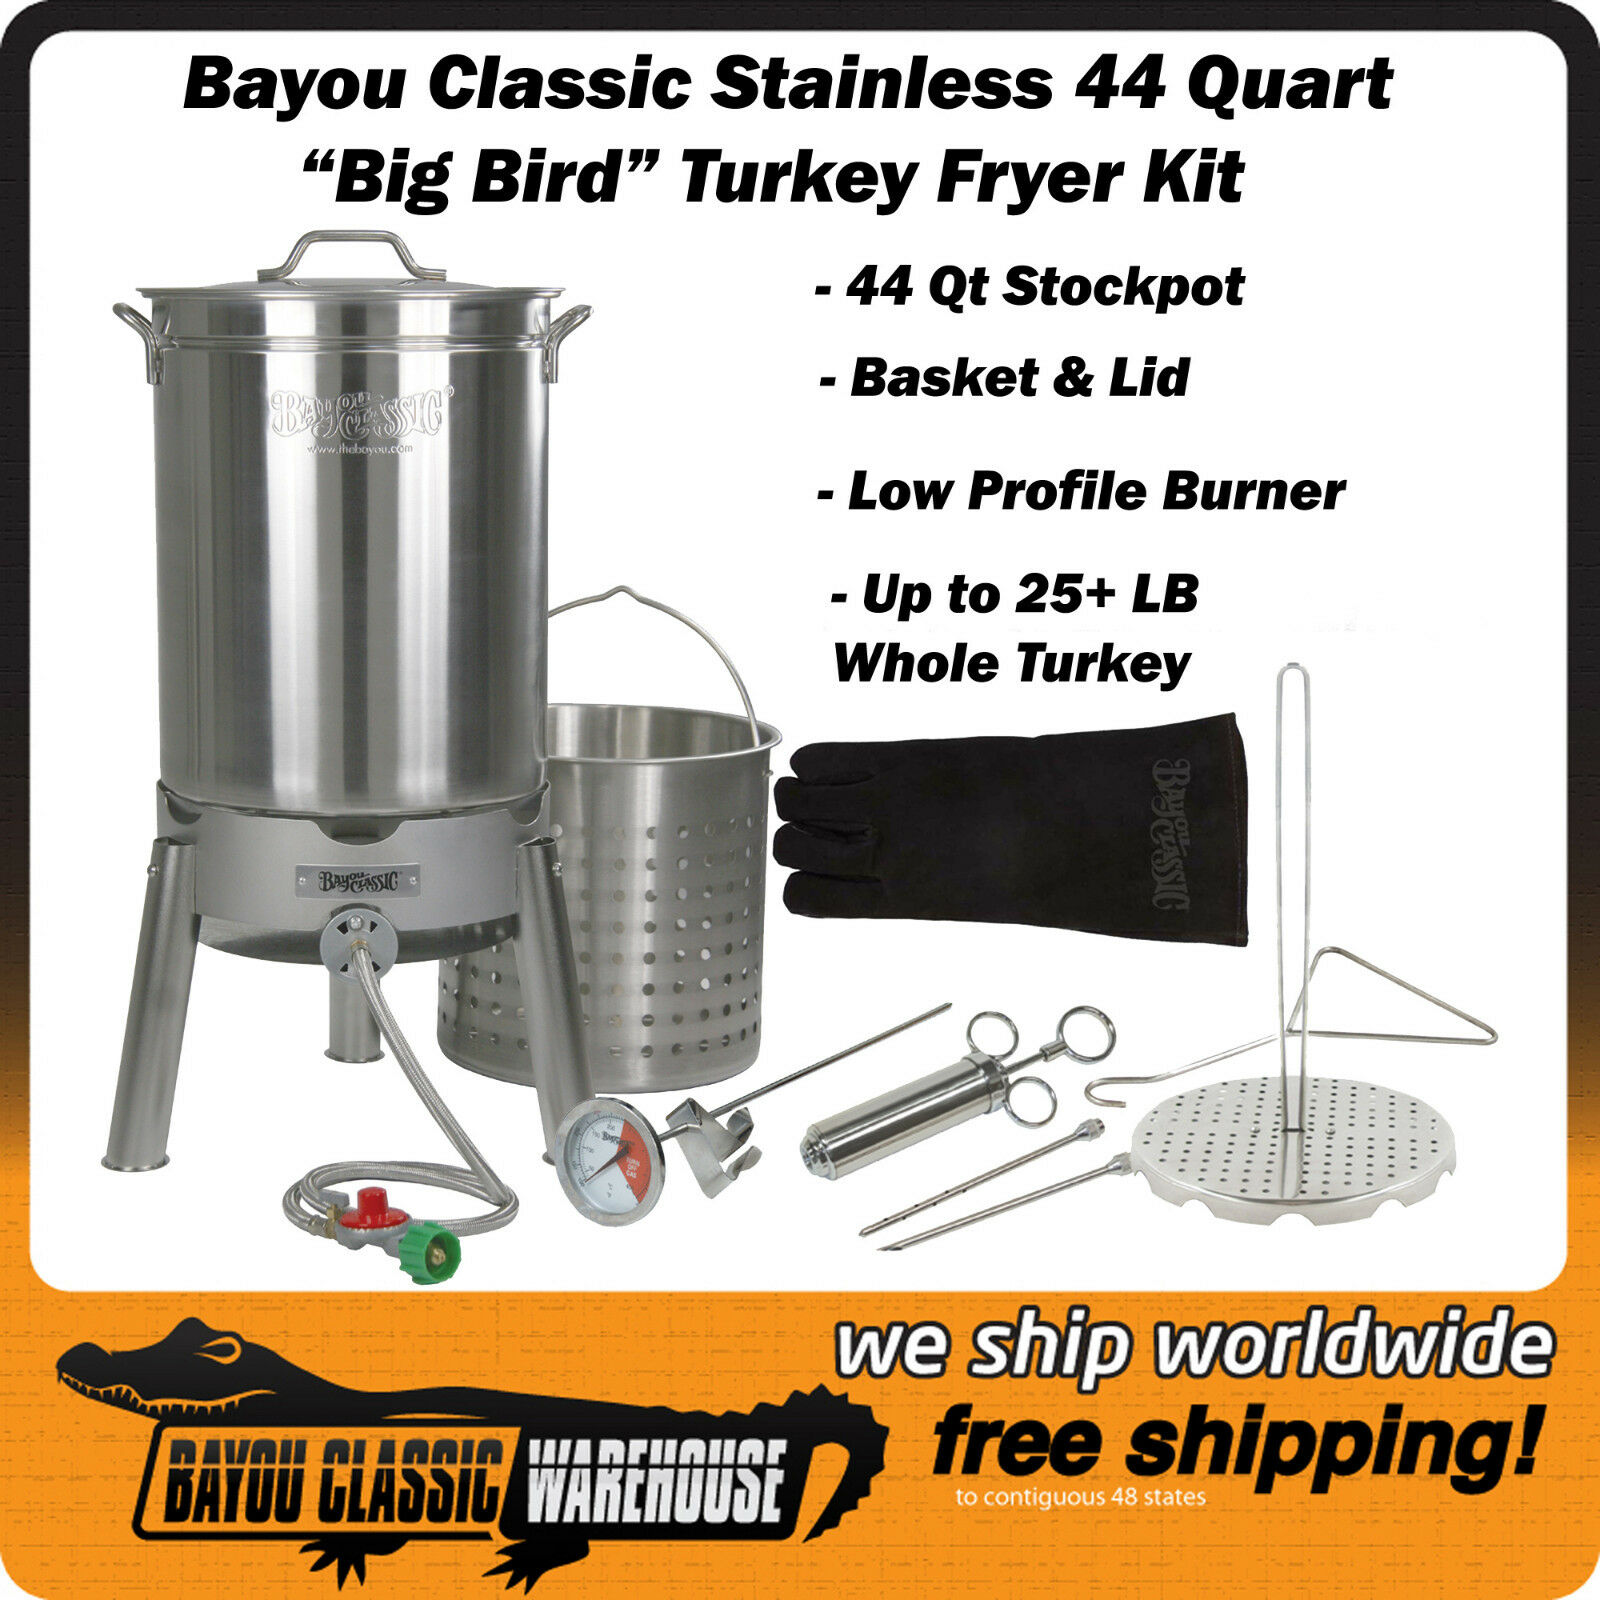 Big Bird Oversized 44 Quart Stainless Deep Fryer Turkey Kit By Bayou Classic